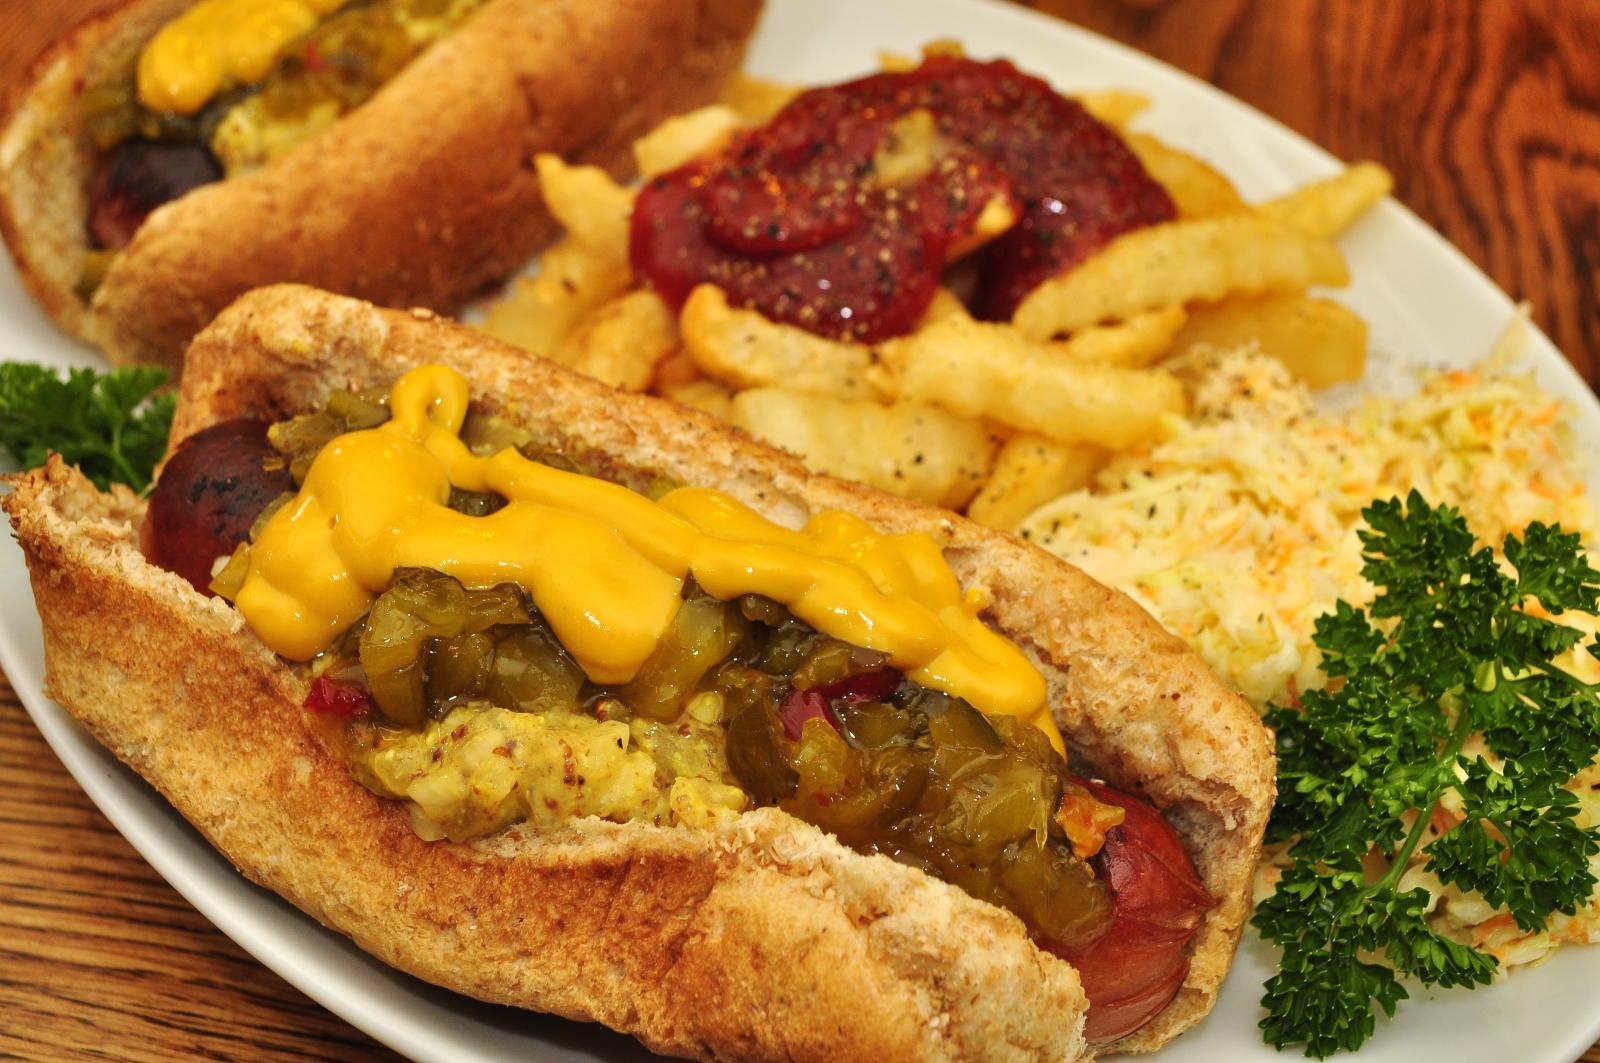 Hot Dogs Wiuth Skjiun That Snaps